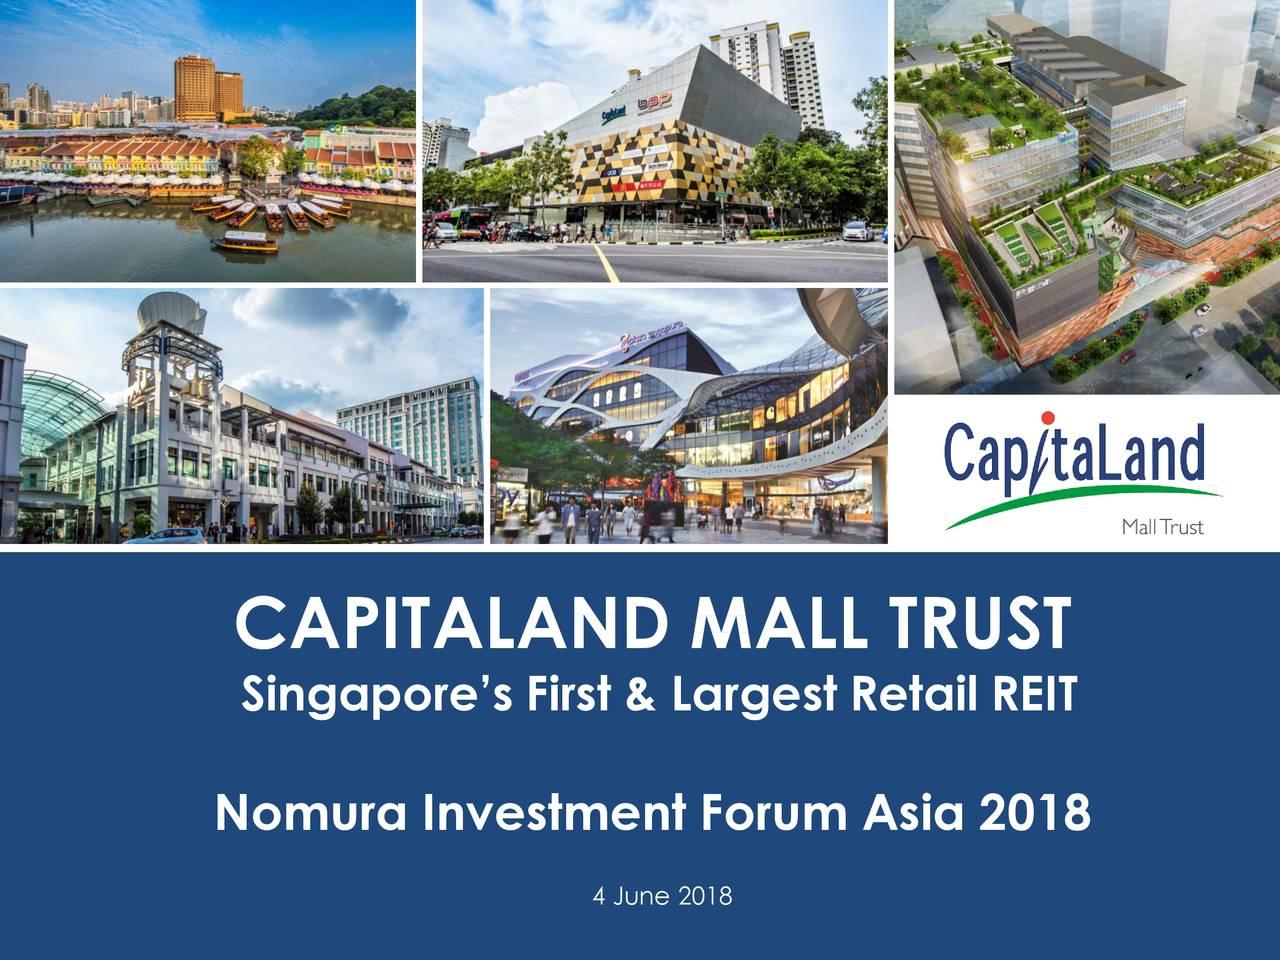 CapitaLand Mall Trust (CPAMF) Presents At Nomura Investment